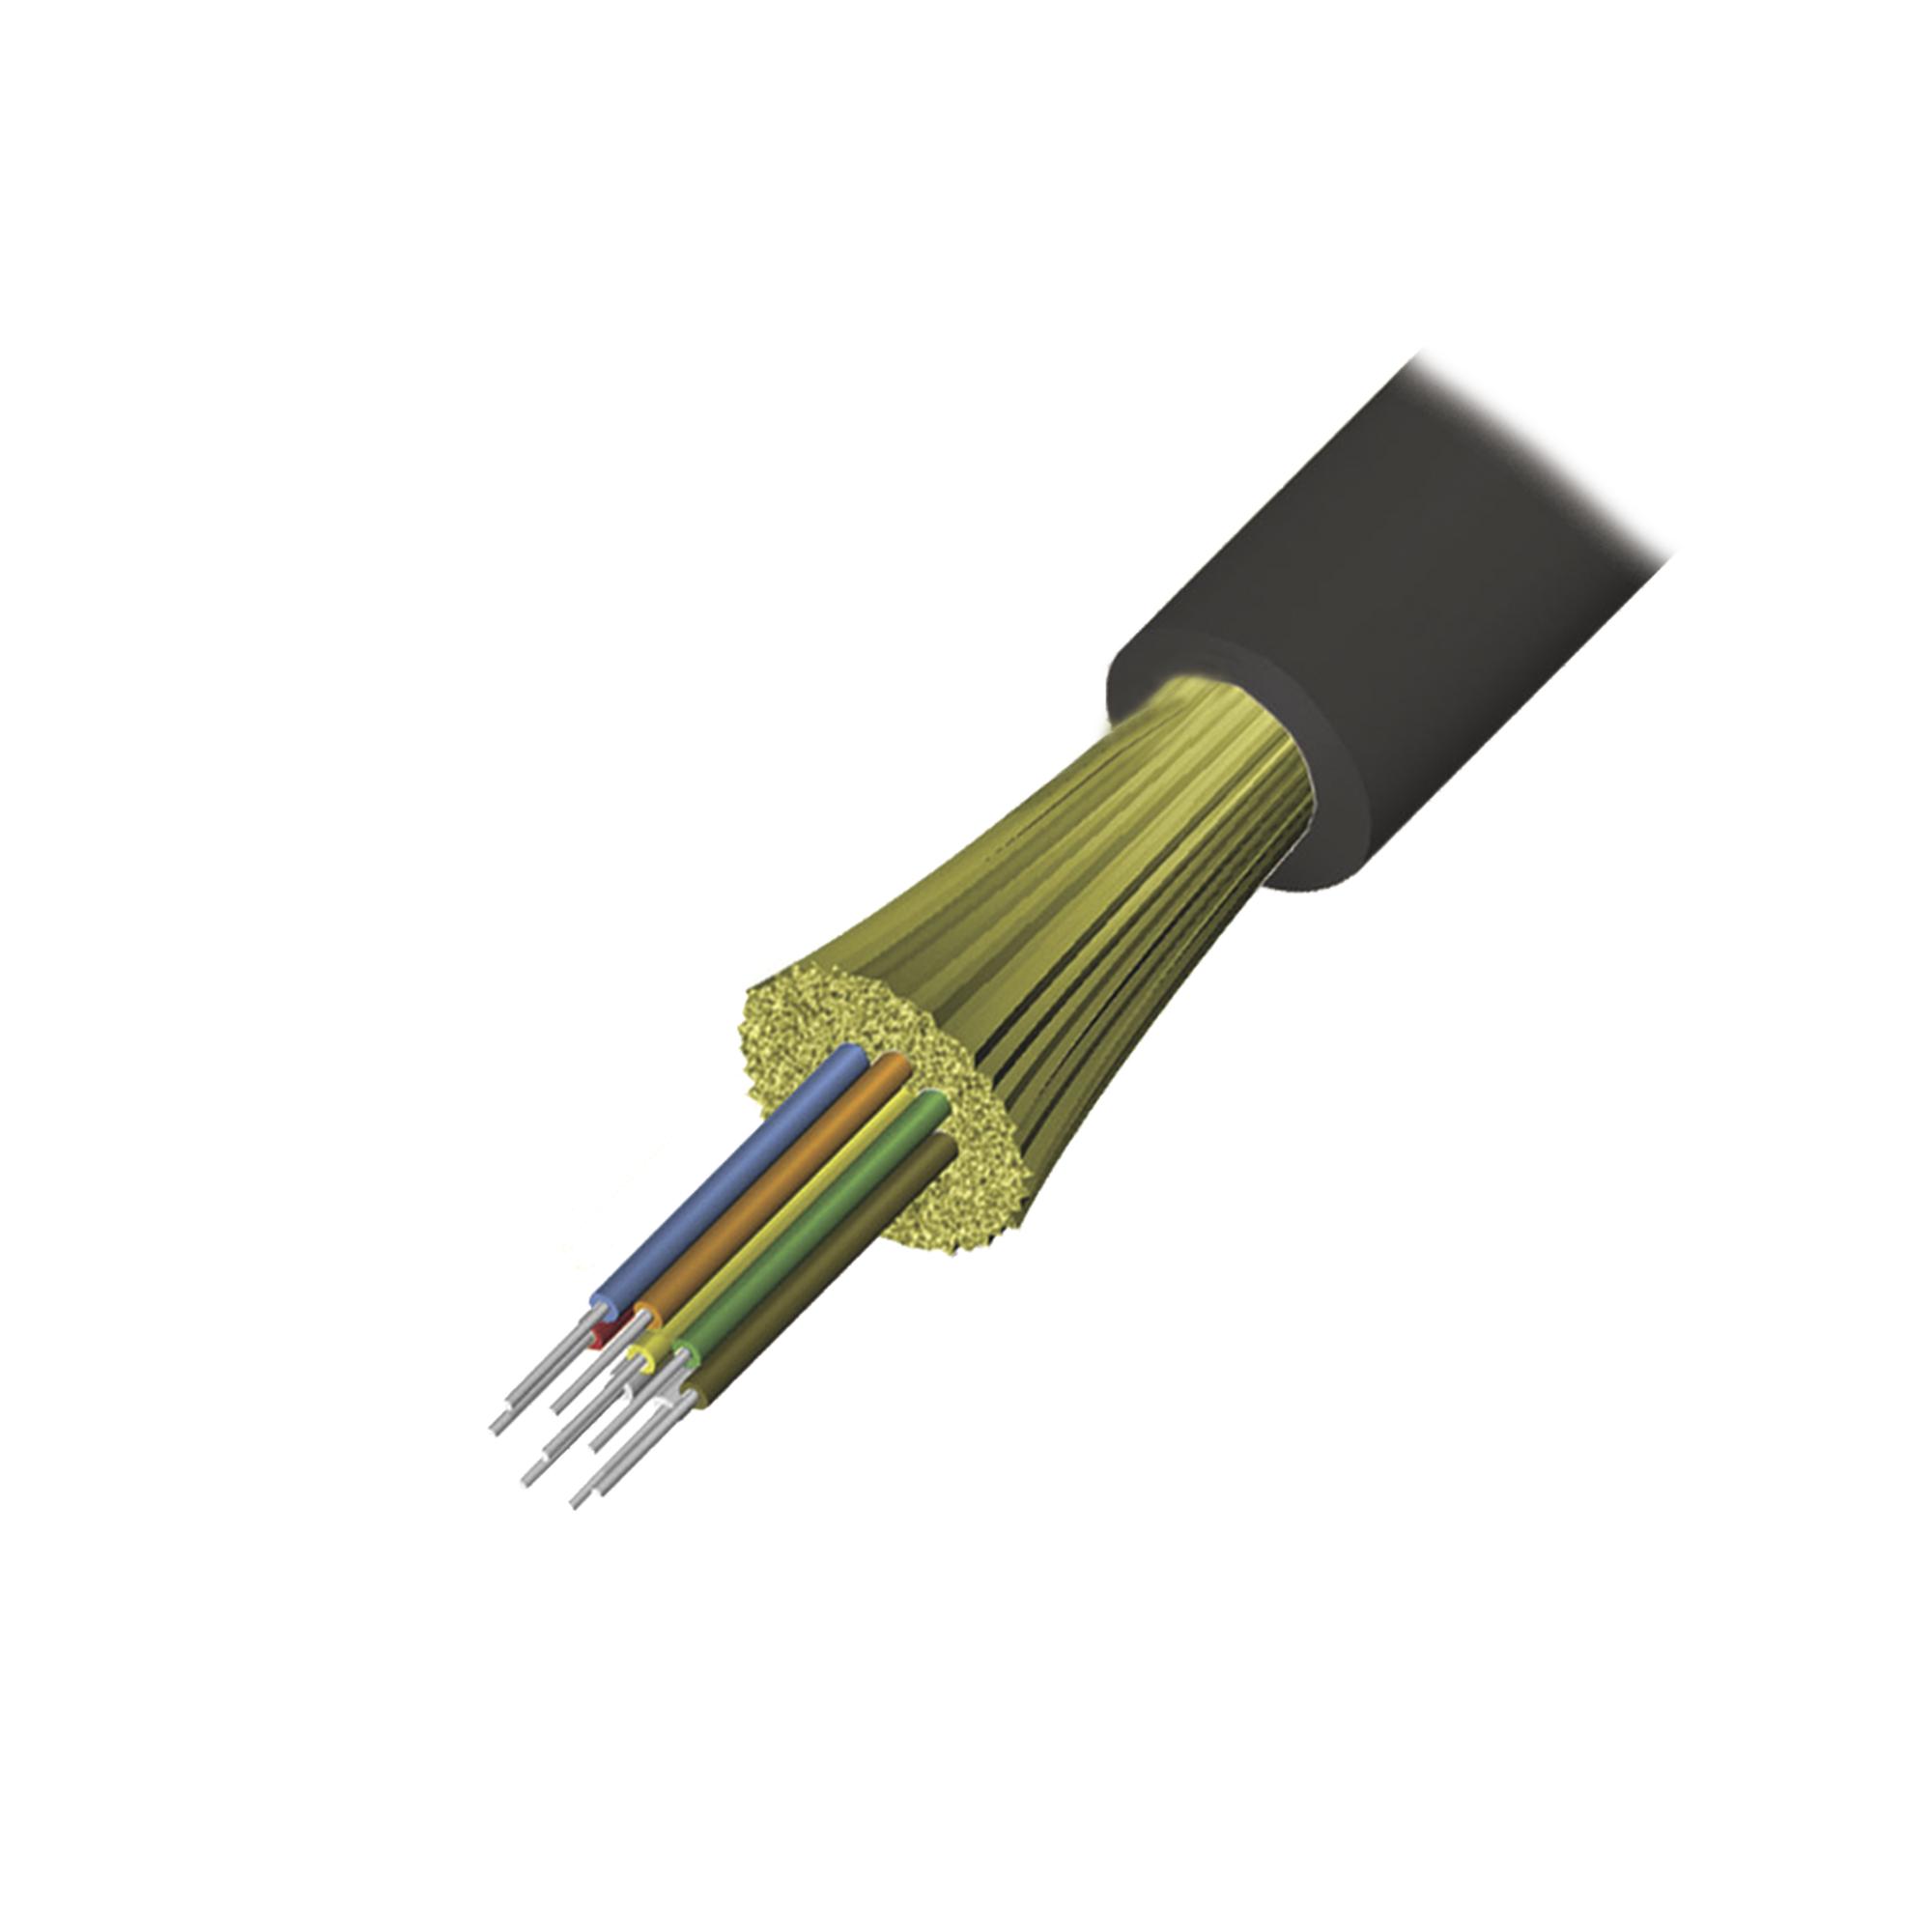 Cable de Fibra Óptica de 12 hilos, Interior/Exterior, Tight Buffer, No Conductiva (Dielectrica), Riser, Multimodo OM3 50/125 optimizada, 1 Metro